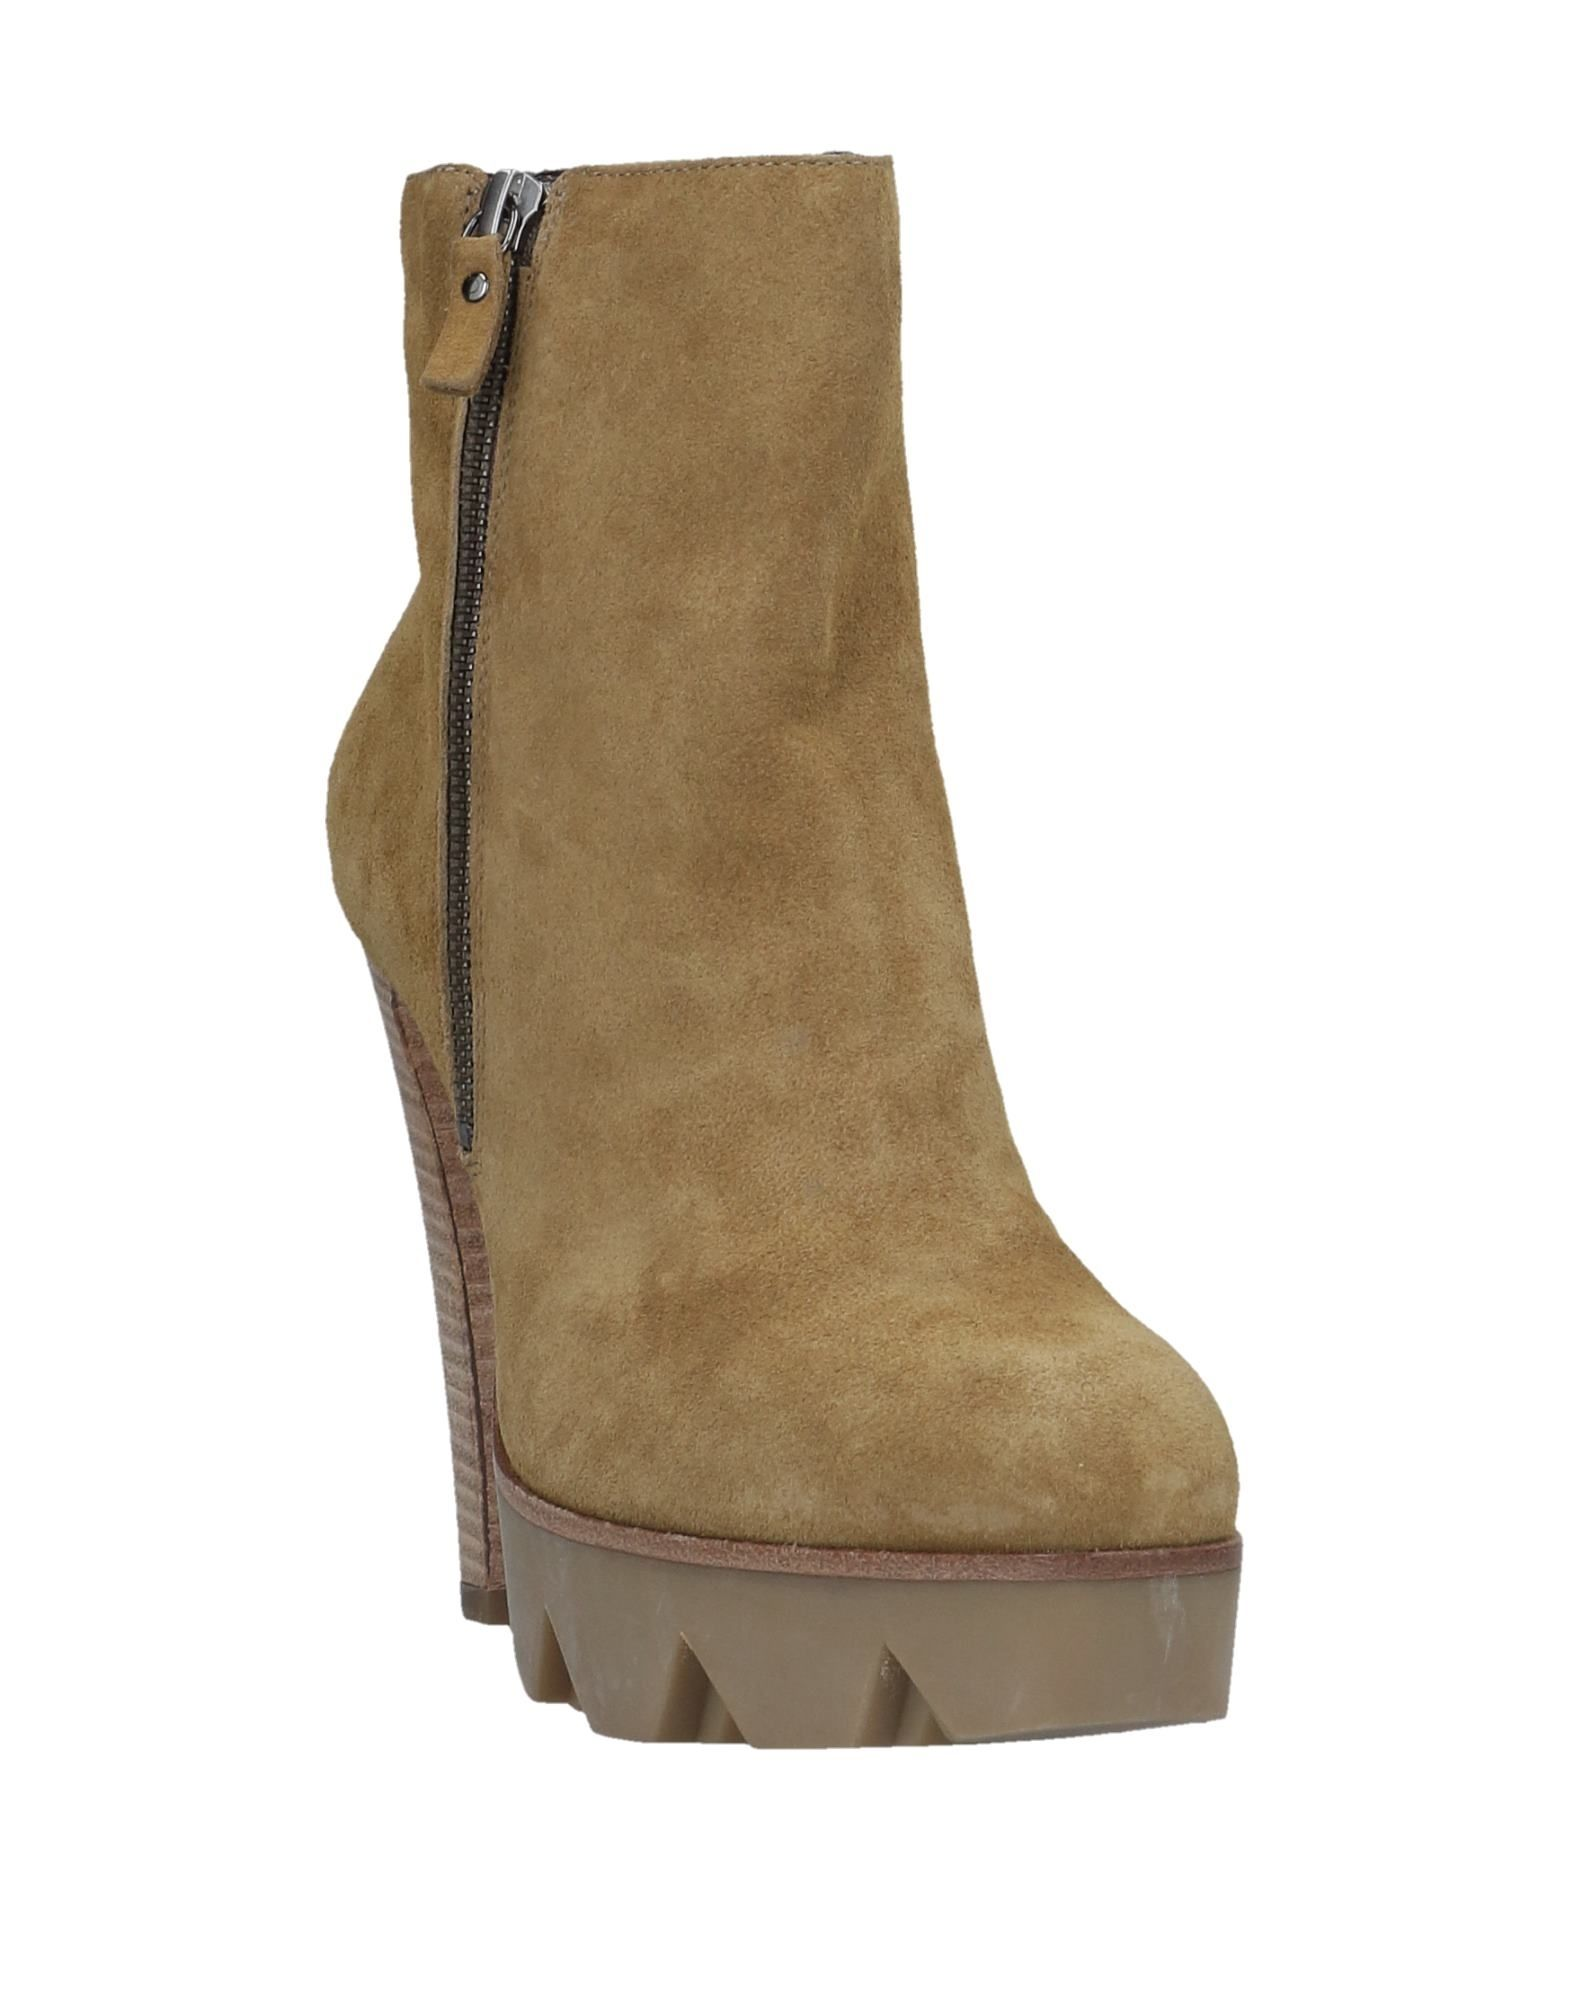 87 Vic Matiē Stiefelette Damen  11527763EAGut aussehende strapazierfähige Schuhe